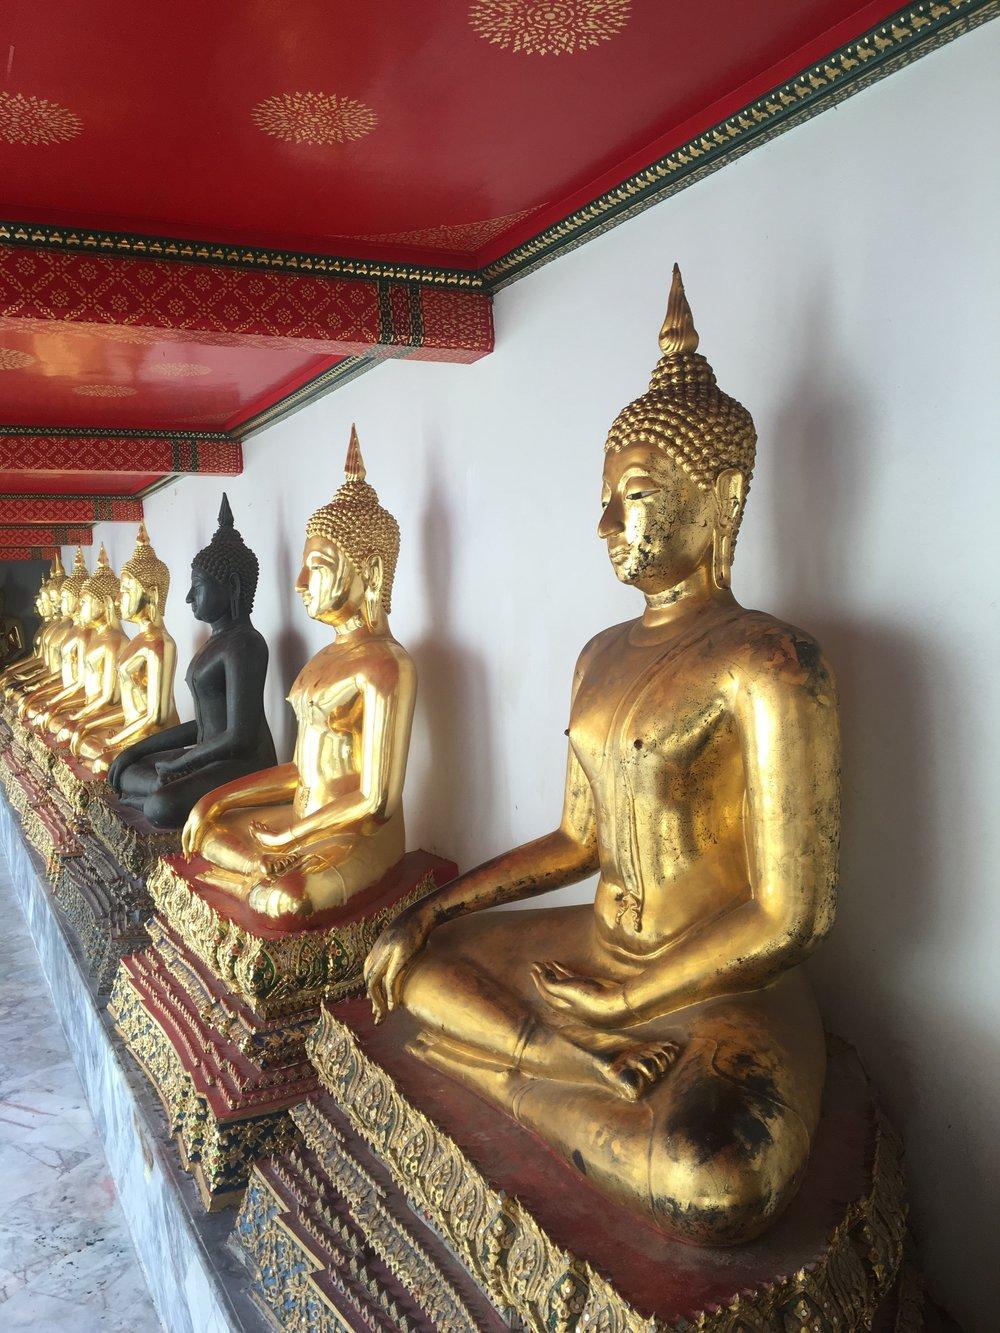 Buddha, Buddha, Buddha, Buddha, Buddha everywhere